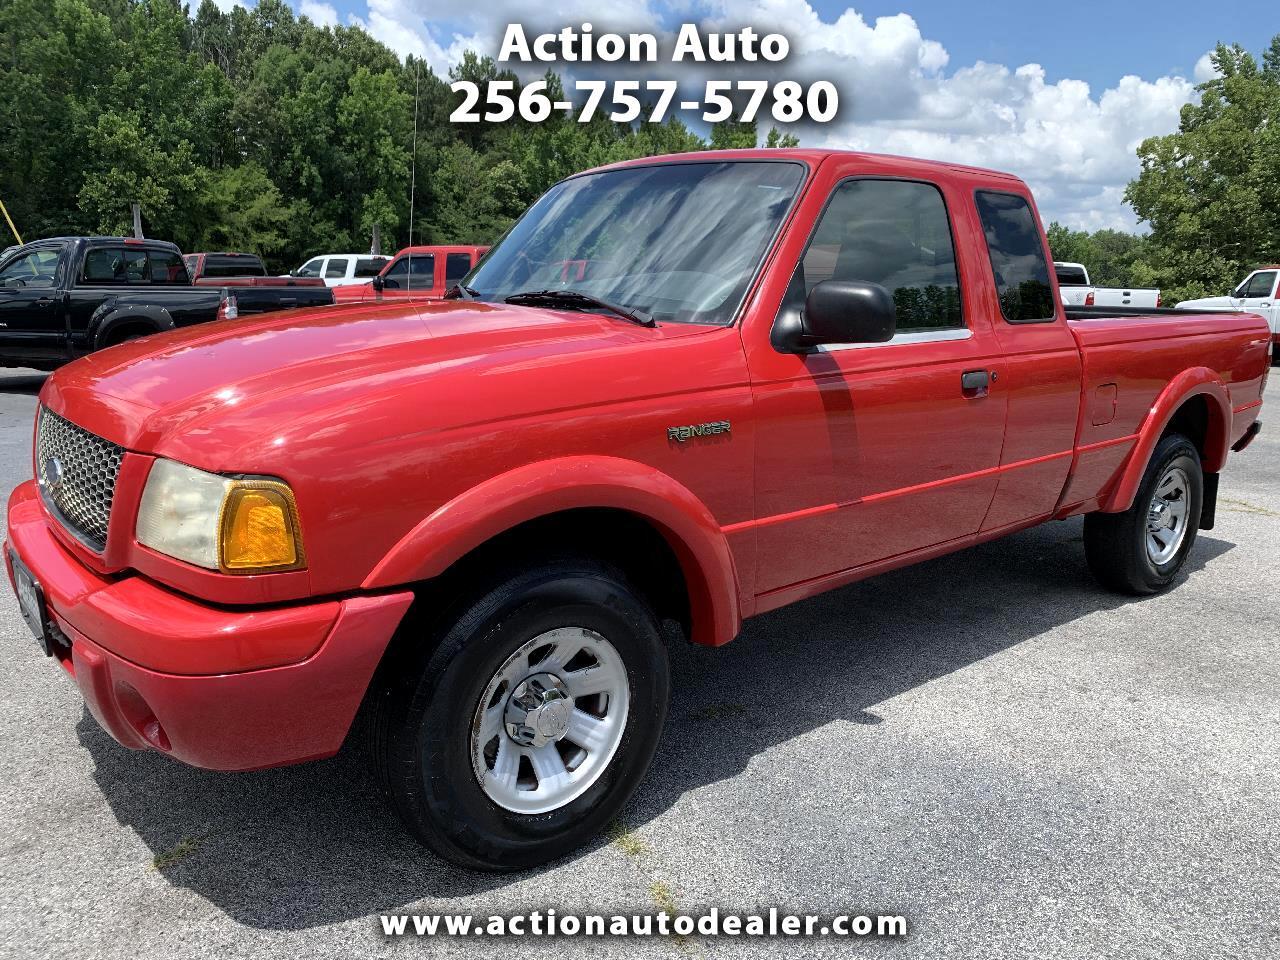 Ford Ranger Edge SuperCab 2WD - 371A 2003